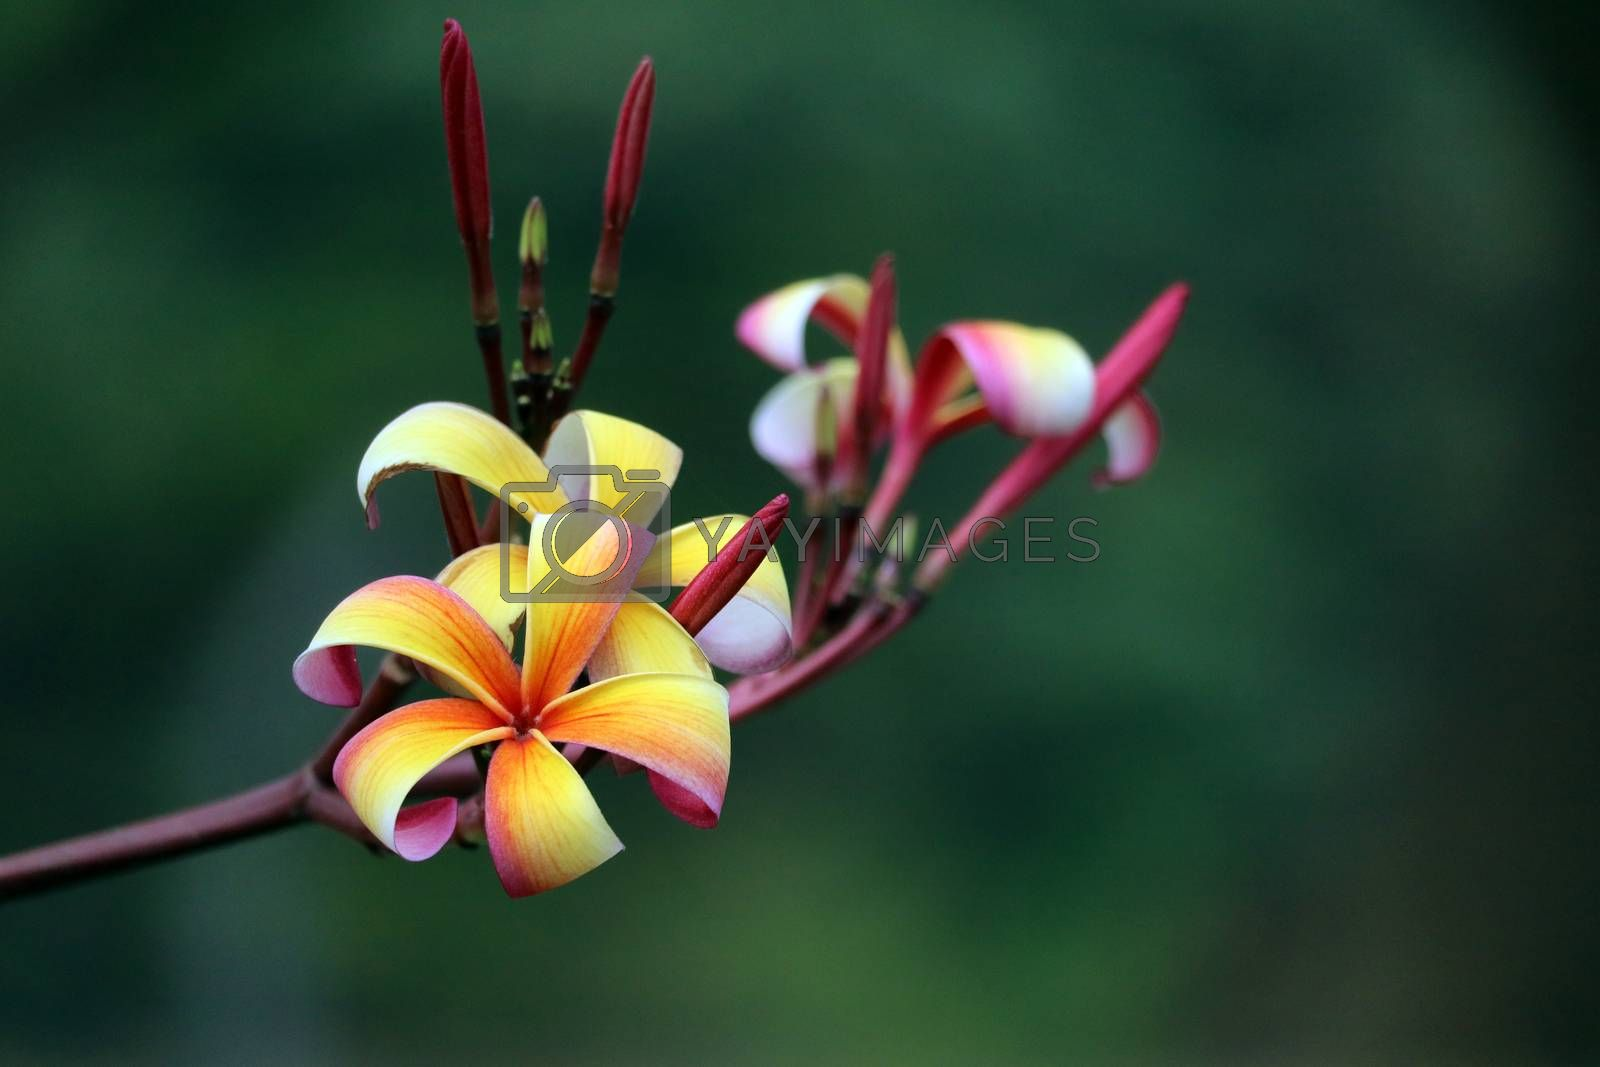 plumeria red white orange yellow bouquet flower blooming in park